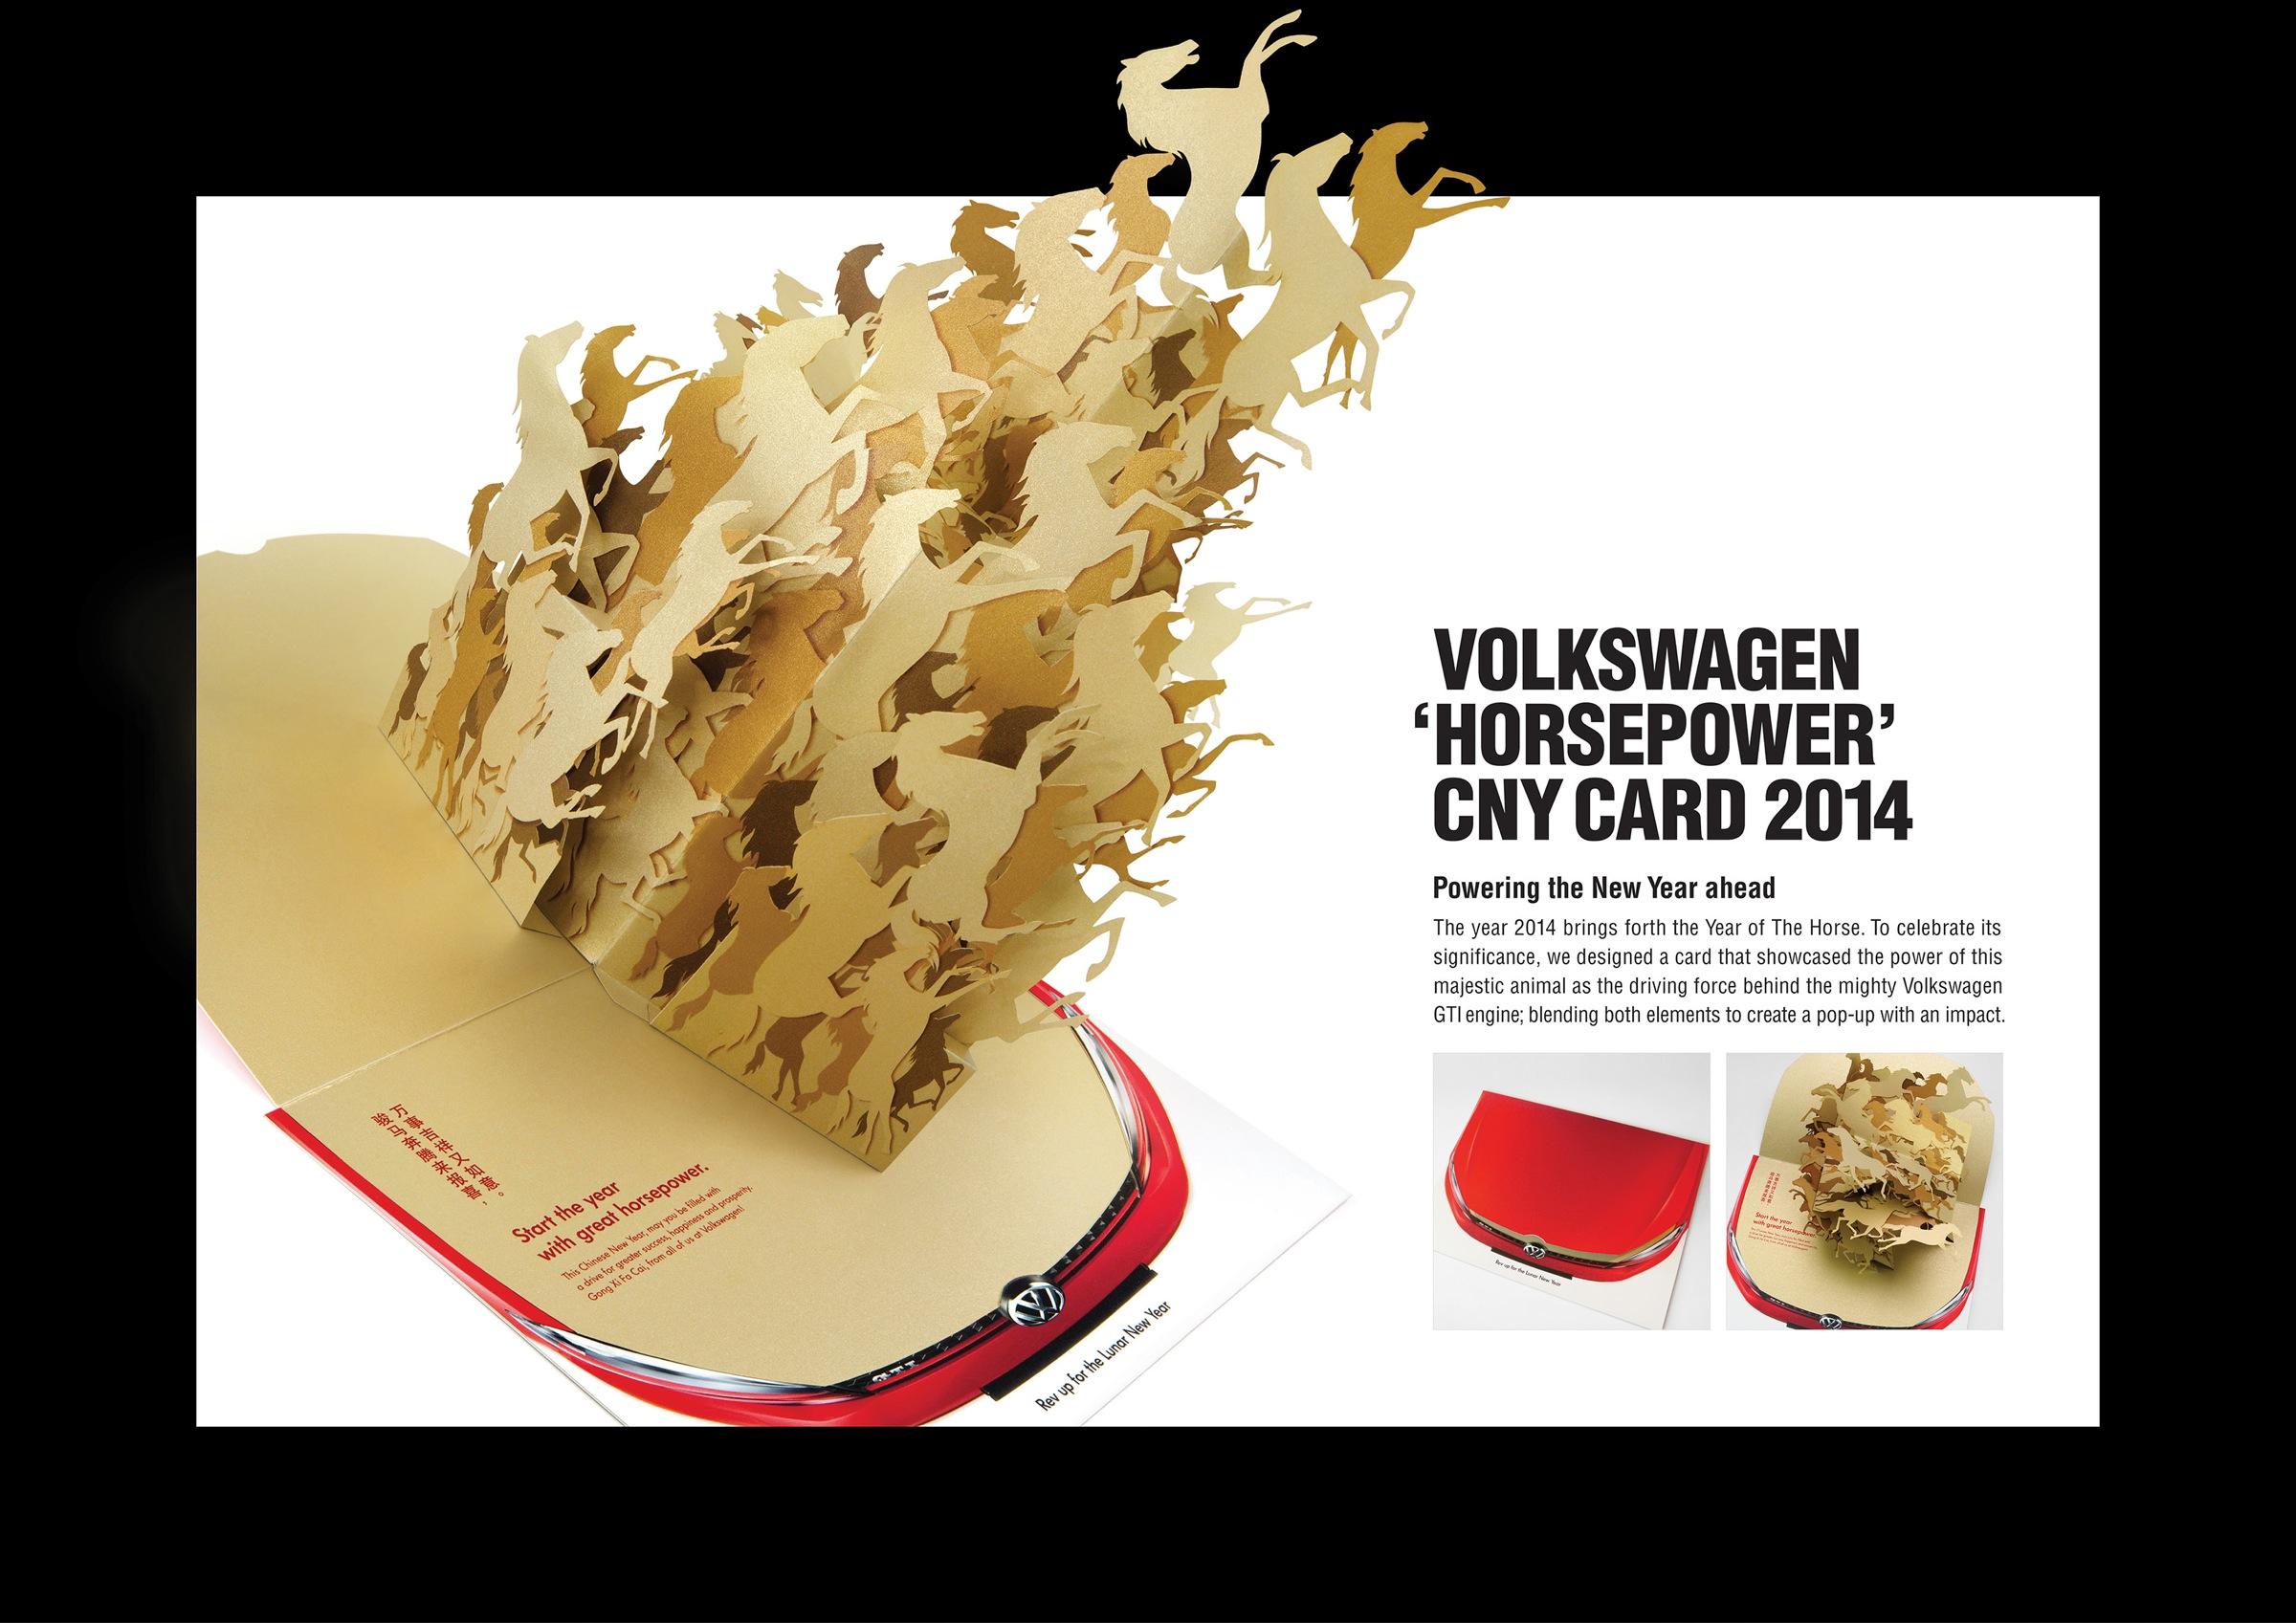 volkswagen direct advert  mc saatchi horsepower ads   world